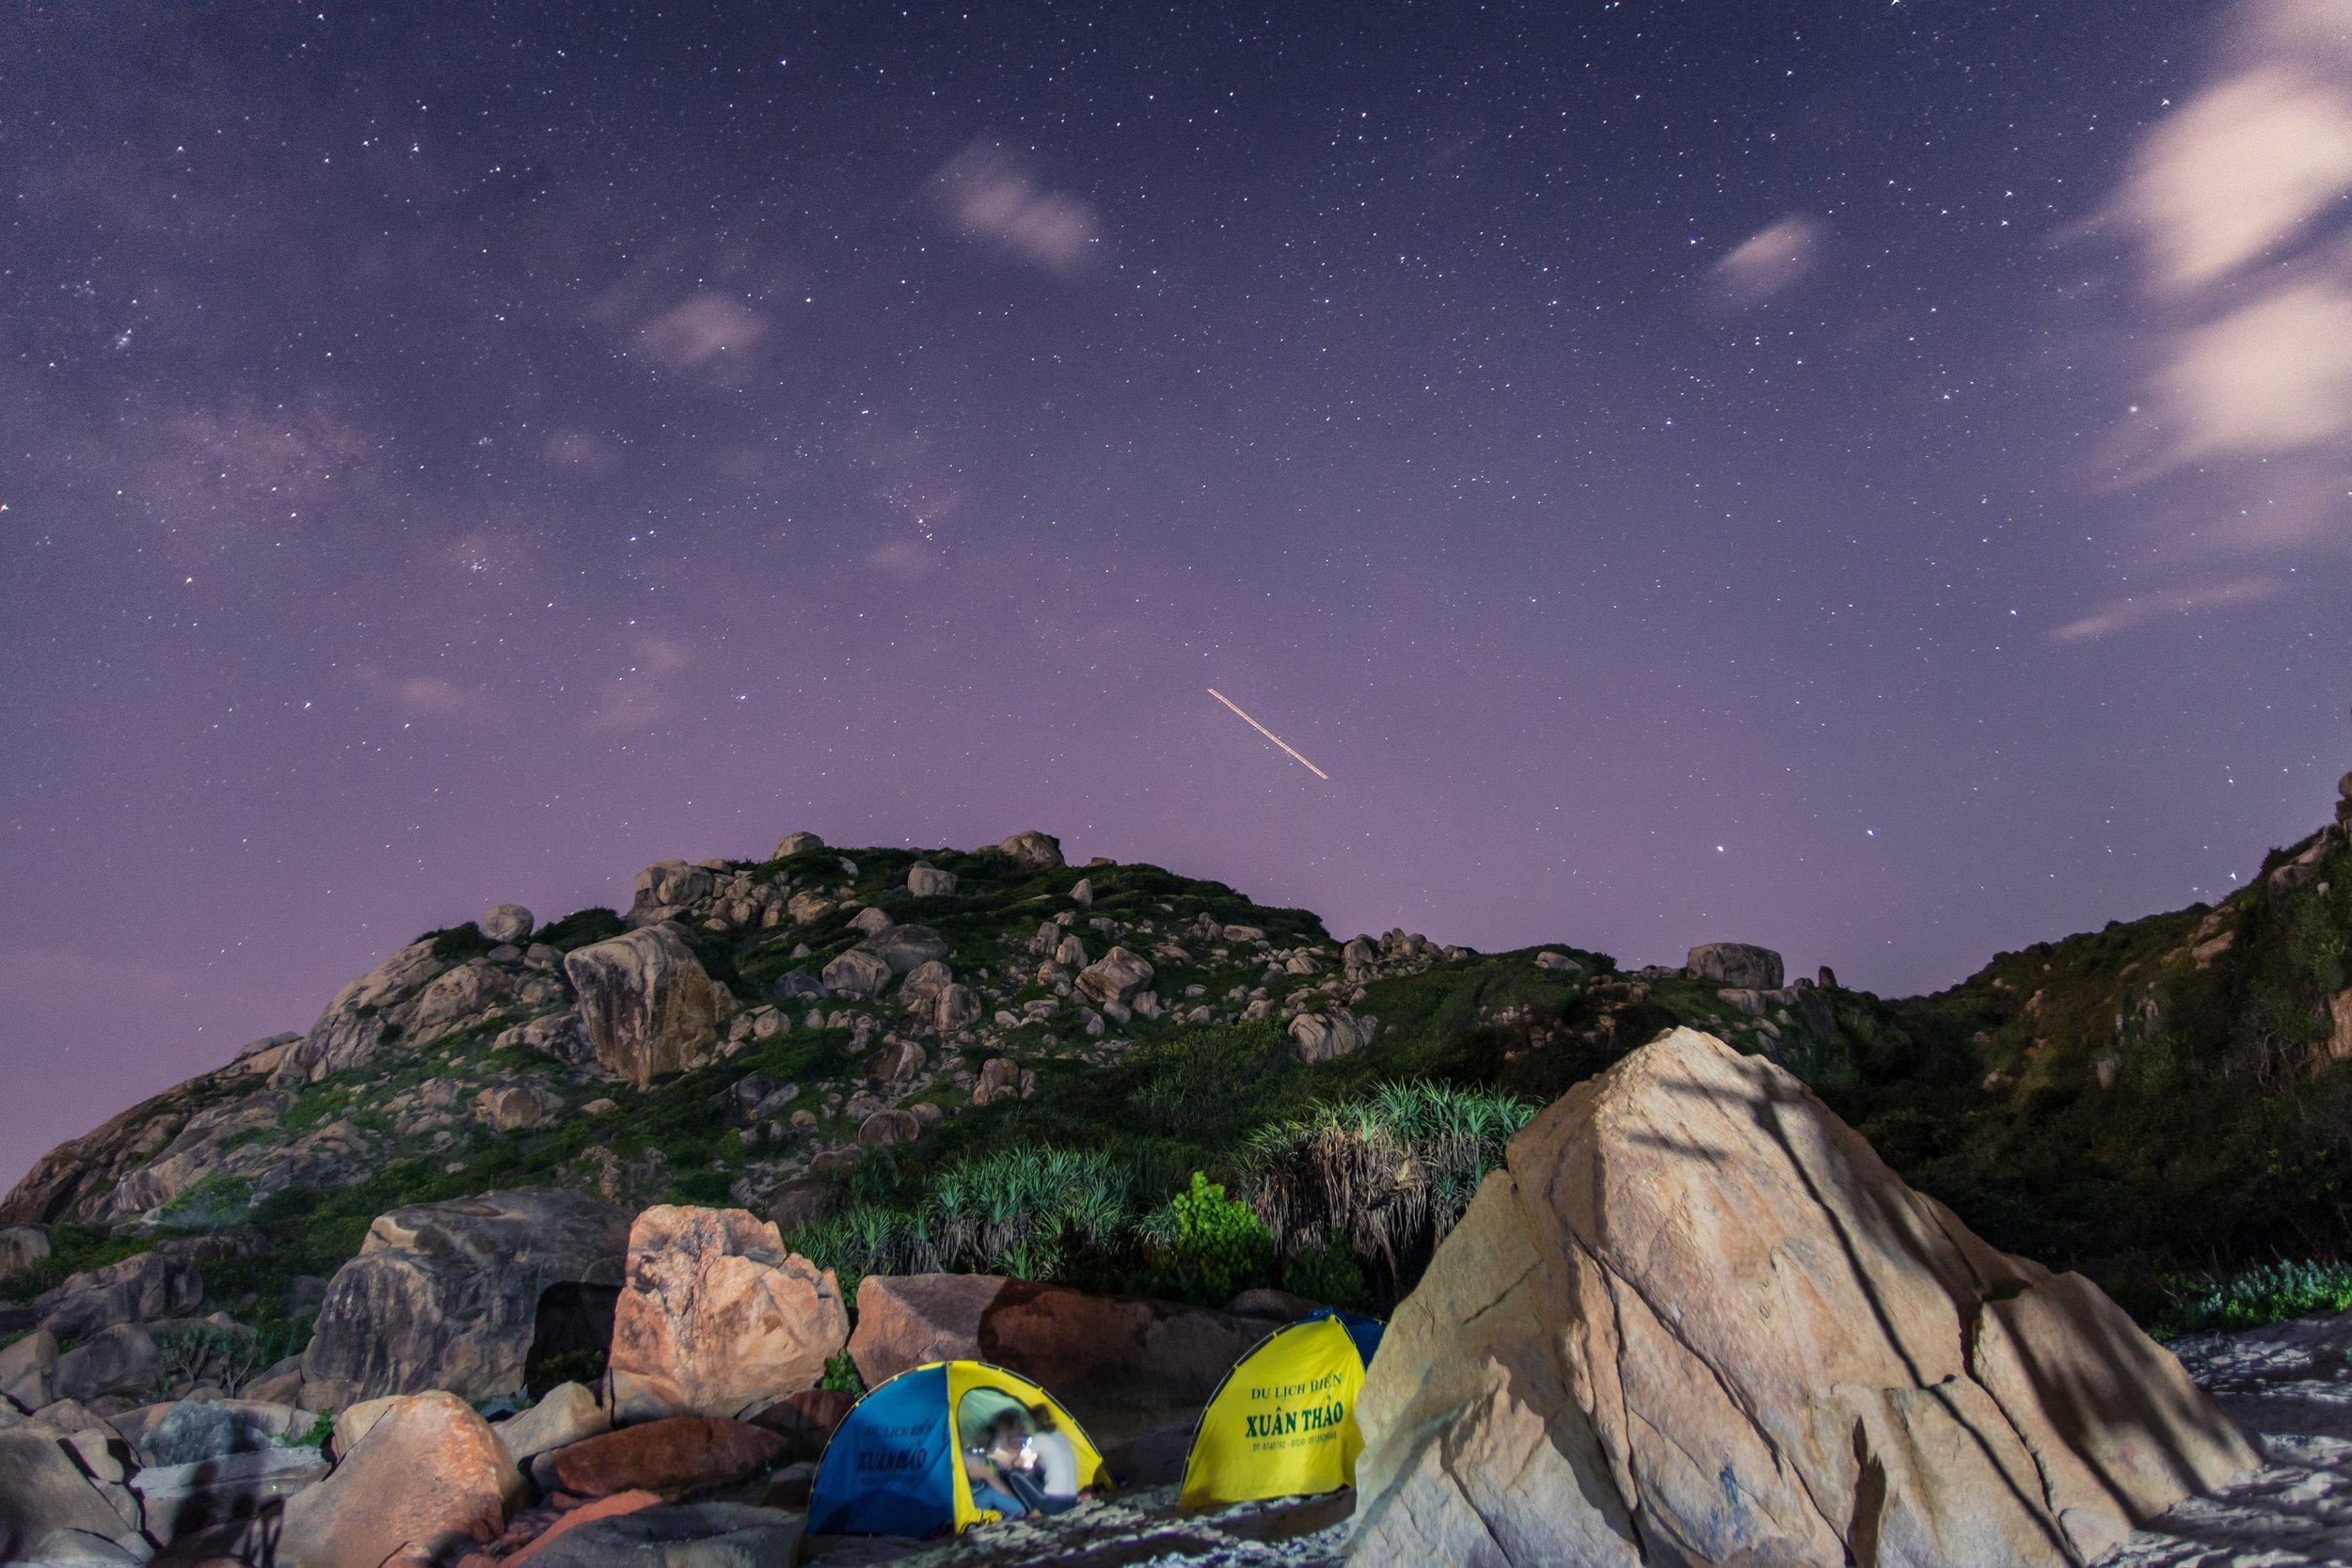 camping-1828200.jpg